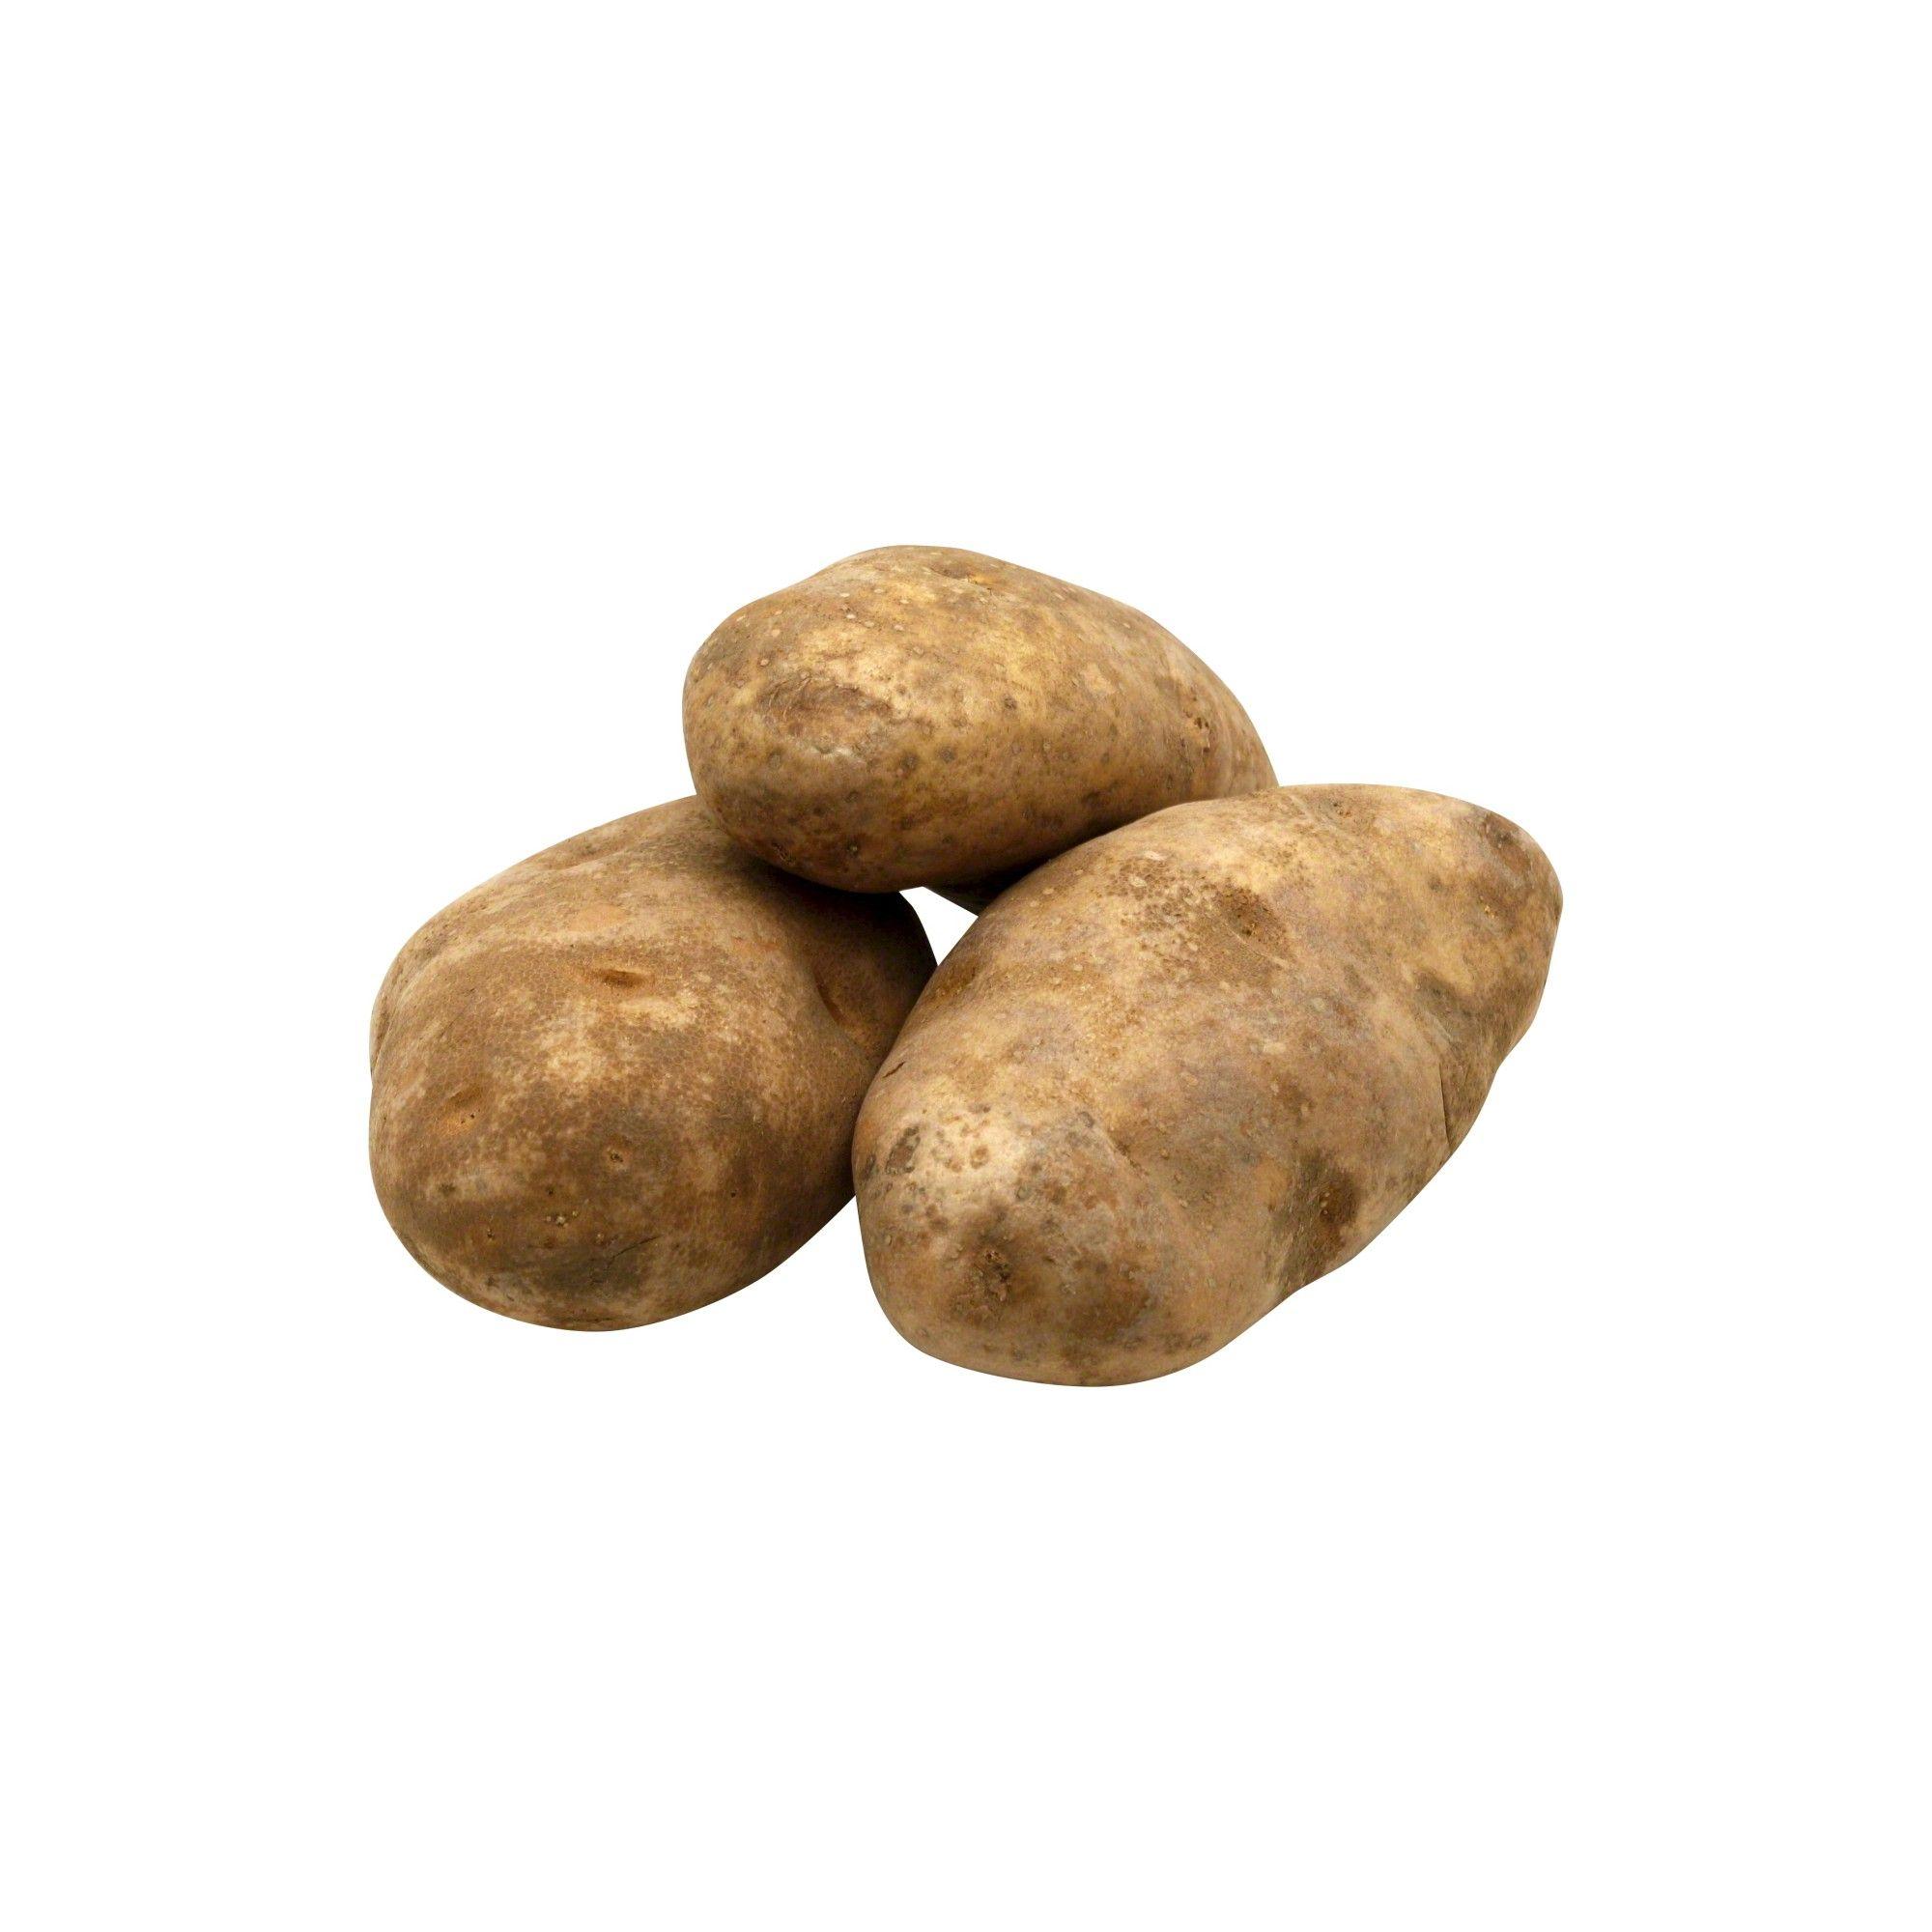 Veg-Land Organic Russet Potatoes - 3lb #russetpotatorecipes